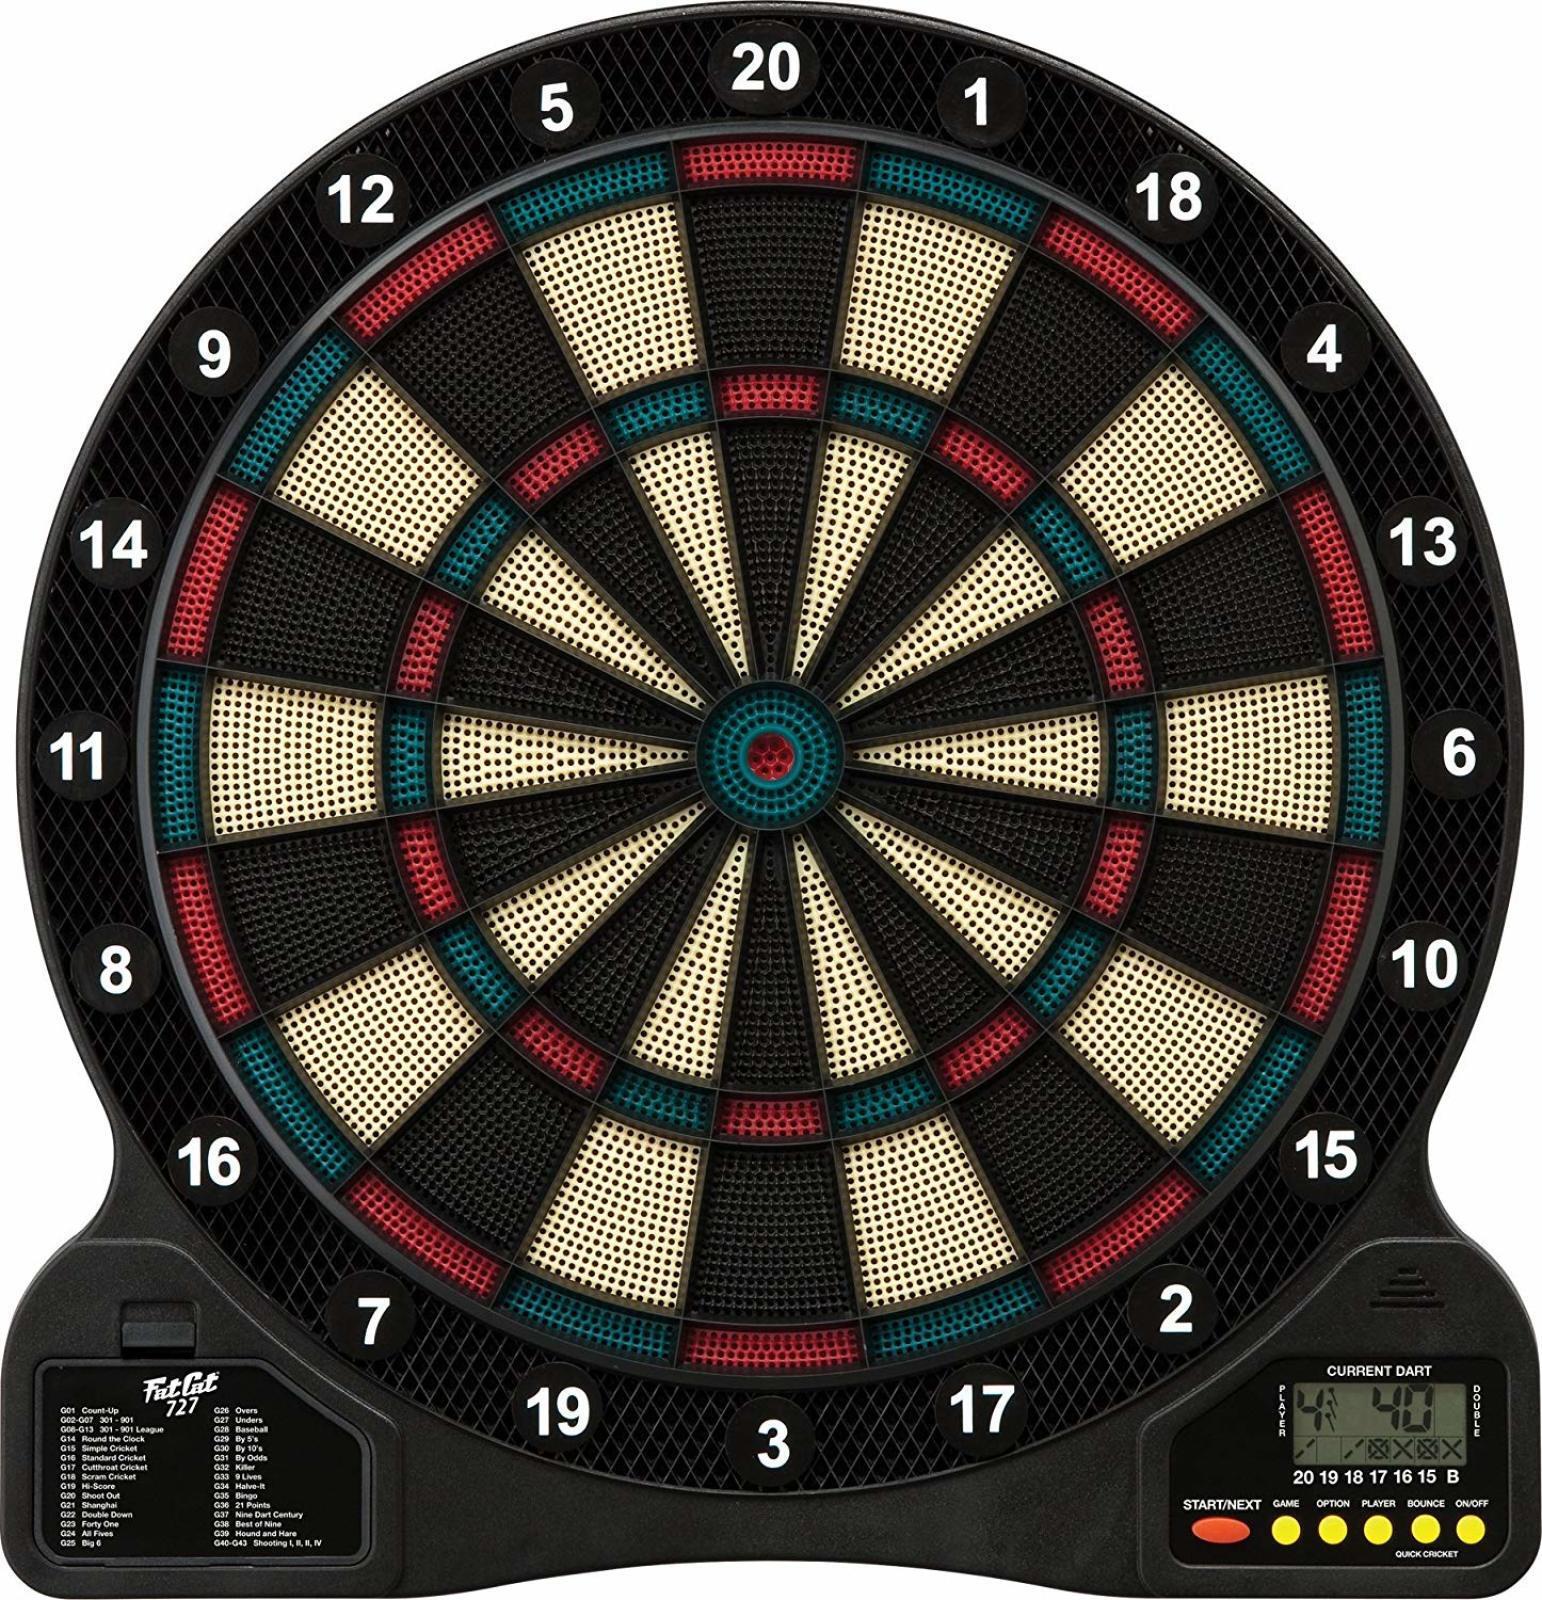 18 Game Electronic Dart Board Soft Tip Dart board Game Digital Dartboard Machine 719265534099  eBay